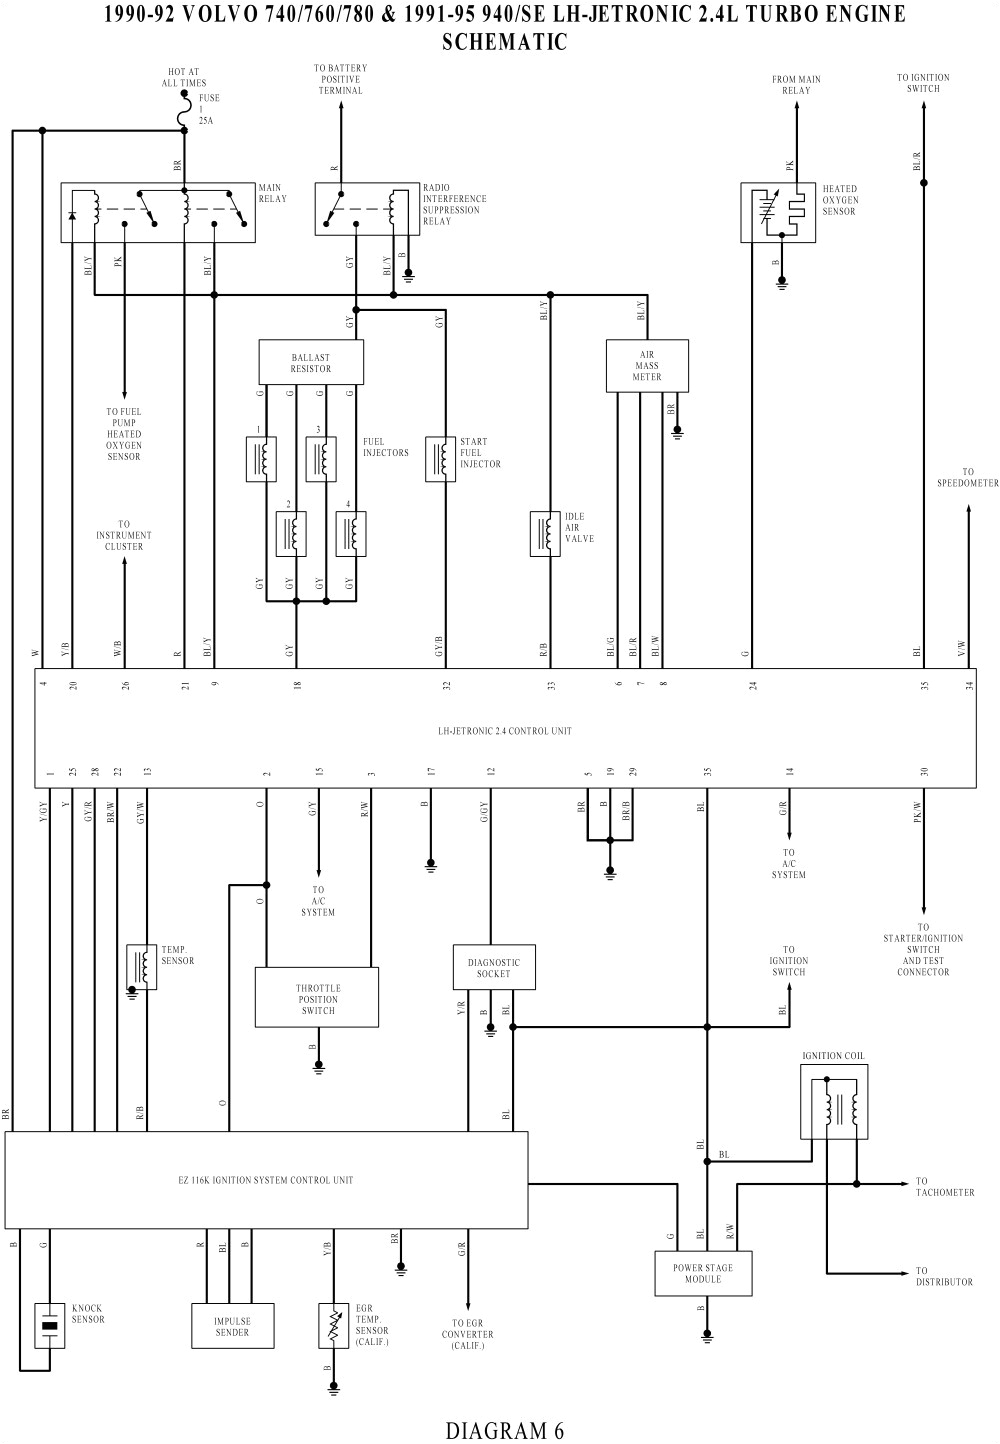 Volvo 240 Stereo Wiring Diagram Volvo 240 Radio Wiring Diagram Wiring Diagram Centre